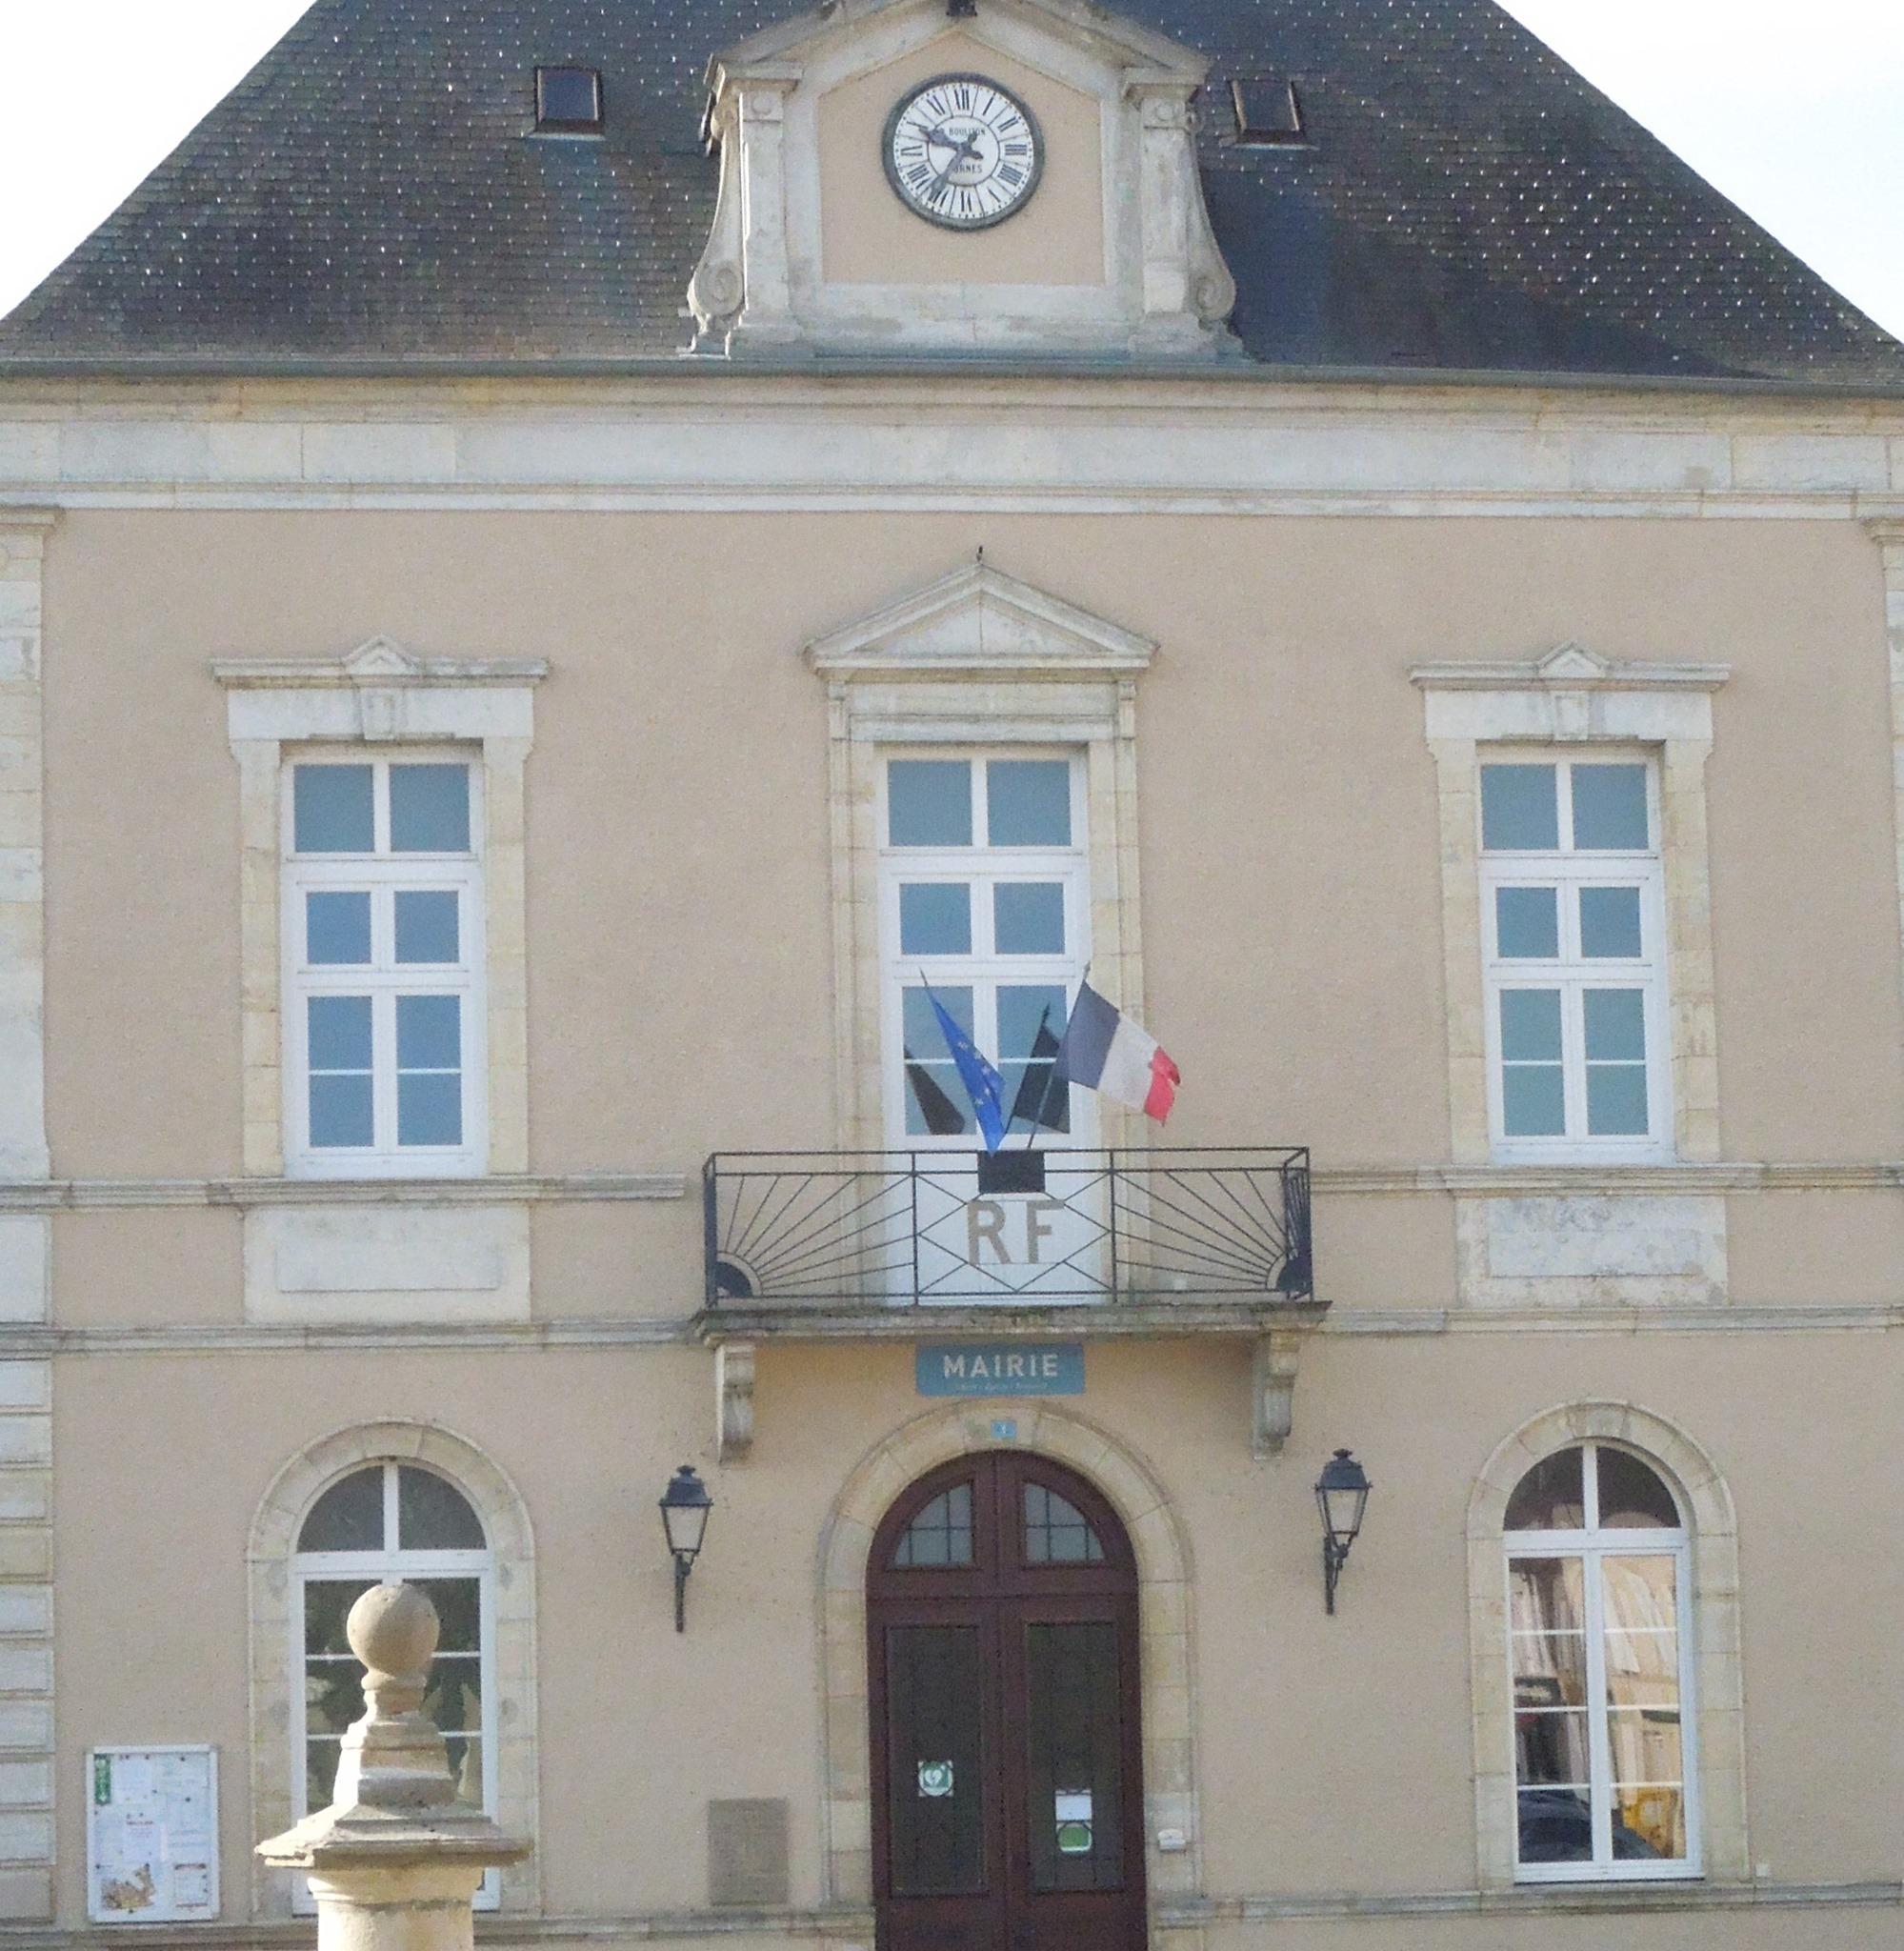 Mairie de Dornes 58390